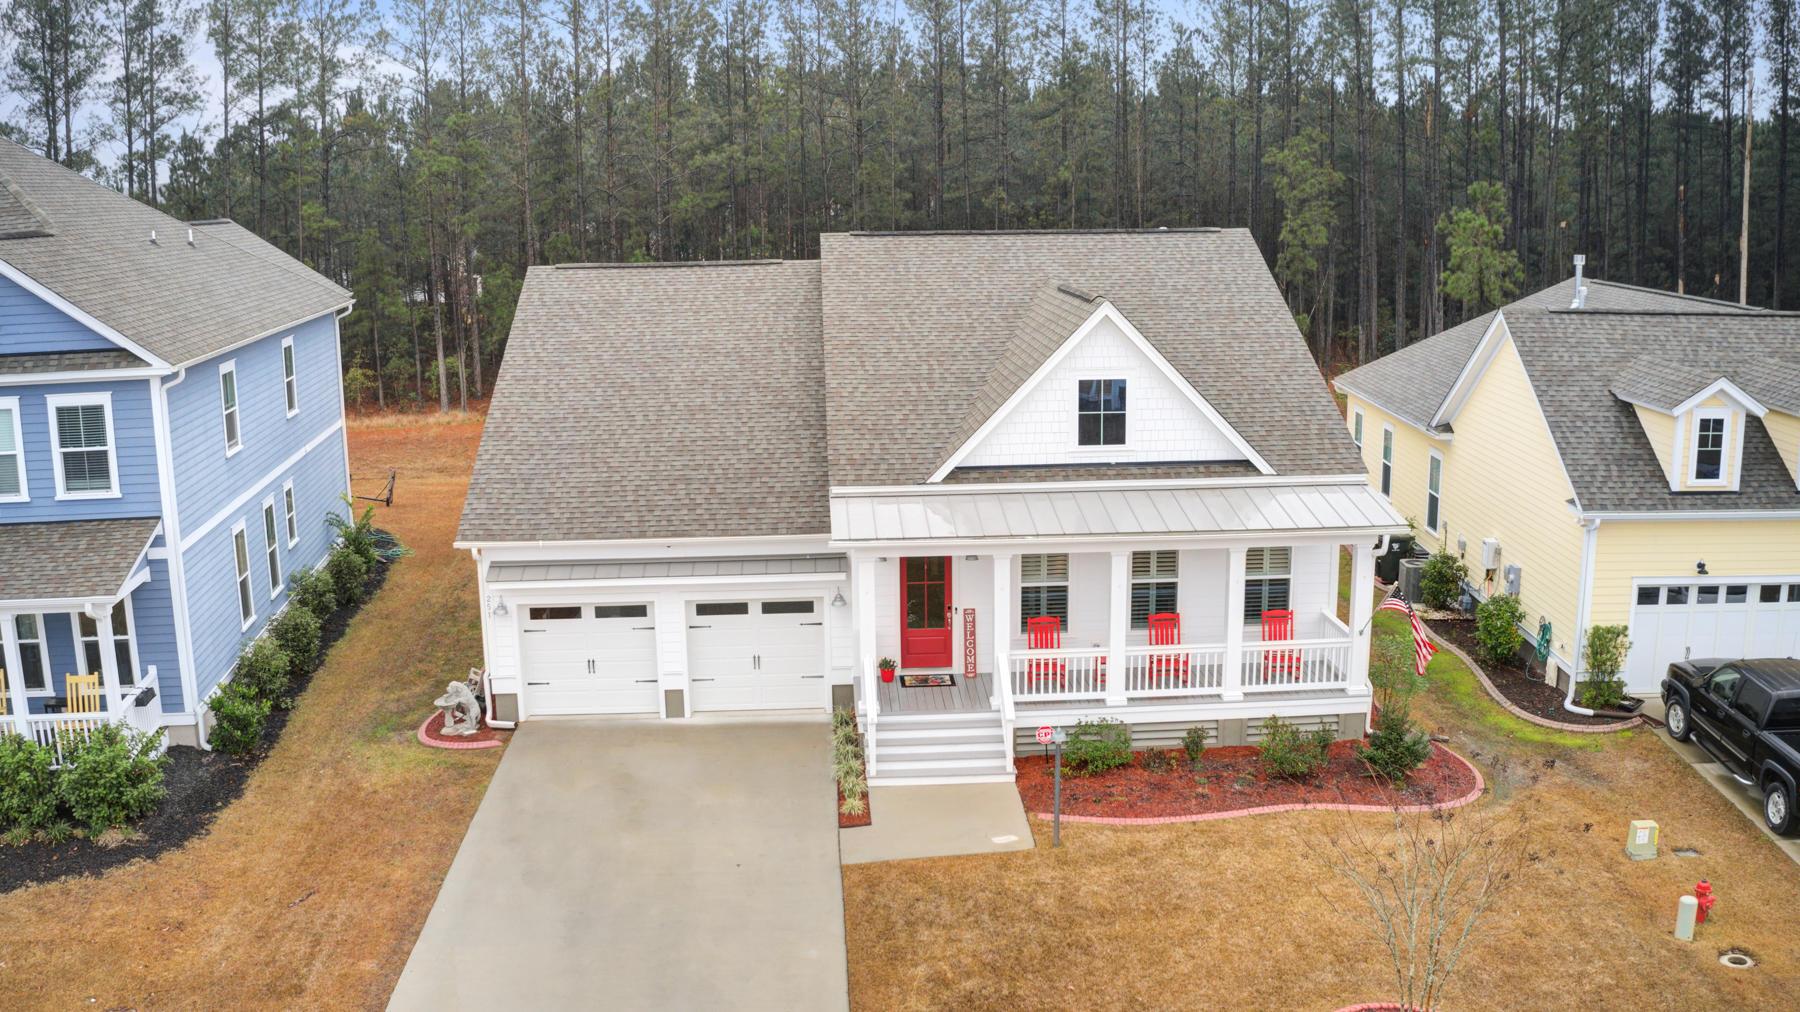 Cane Bay Plantation Homes For Sale - 251 Calm Water, Summerville, SC - 3